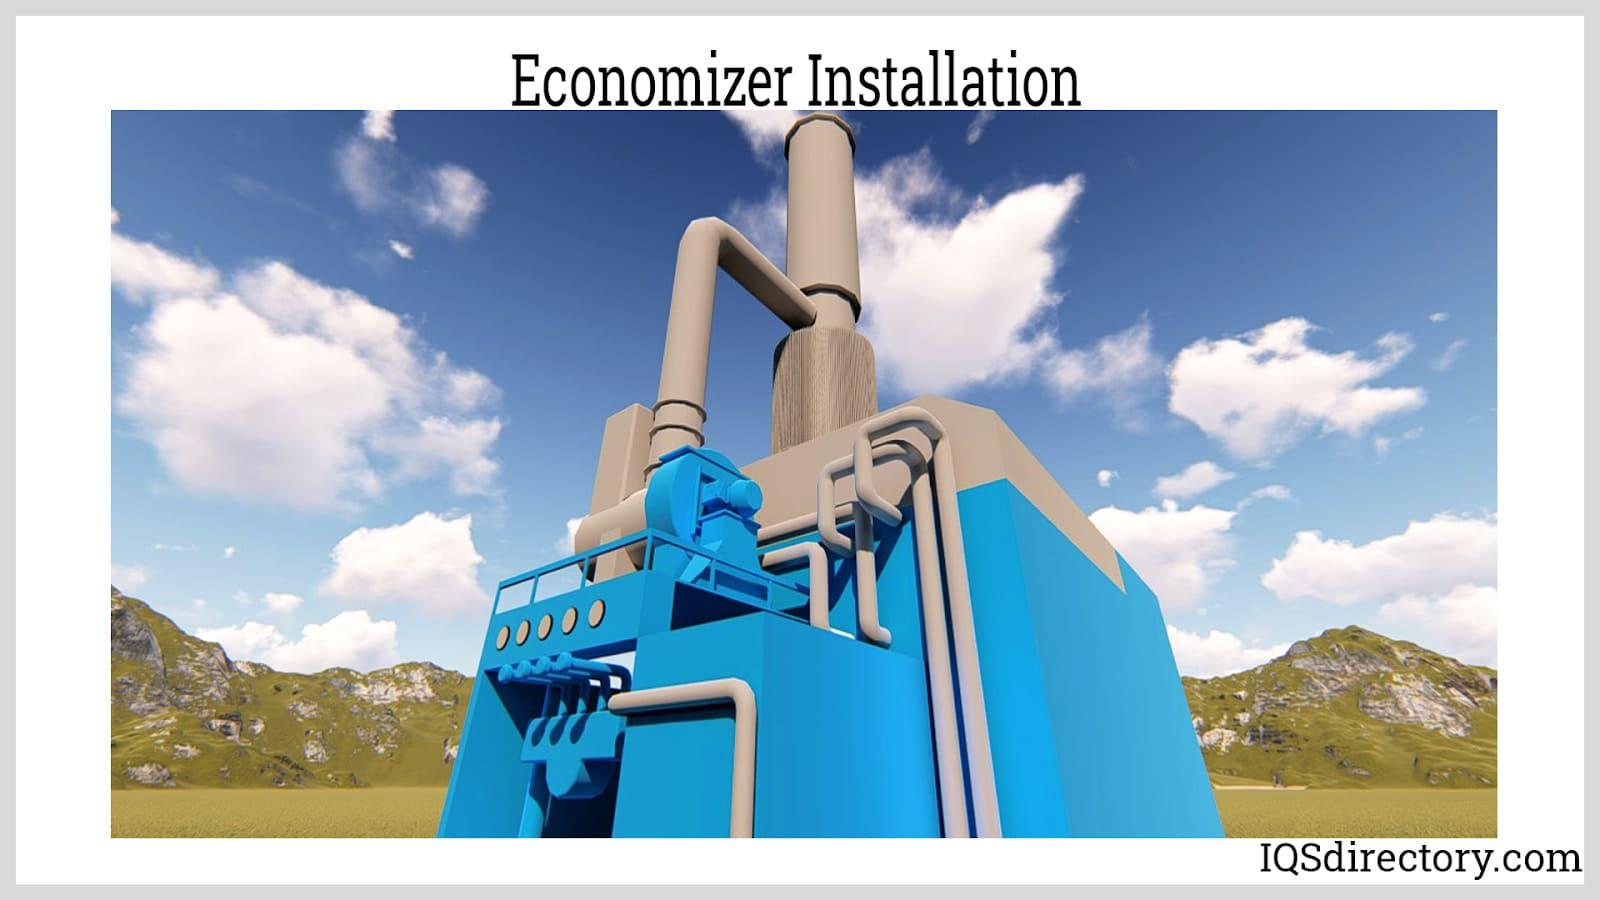 Economizer Installation